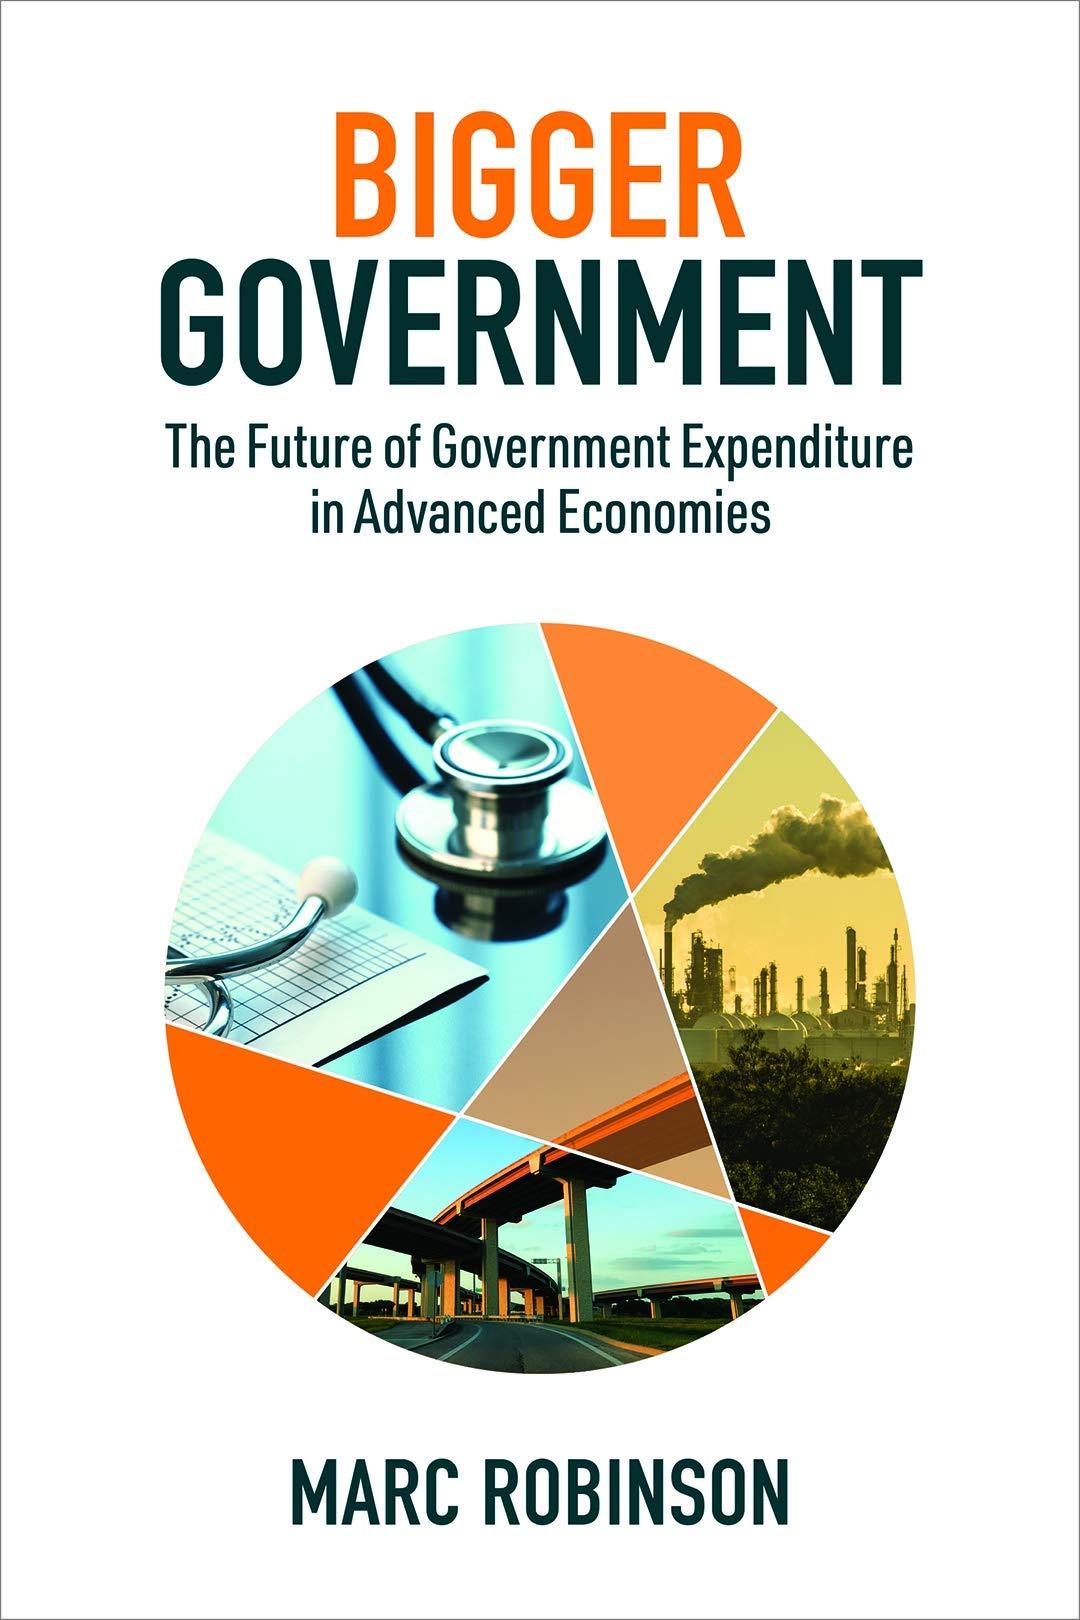 Bigger Government: The Future Of Government Expenditure in Advanced Economies